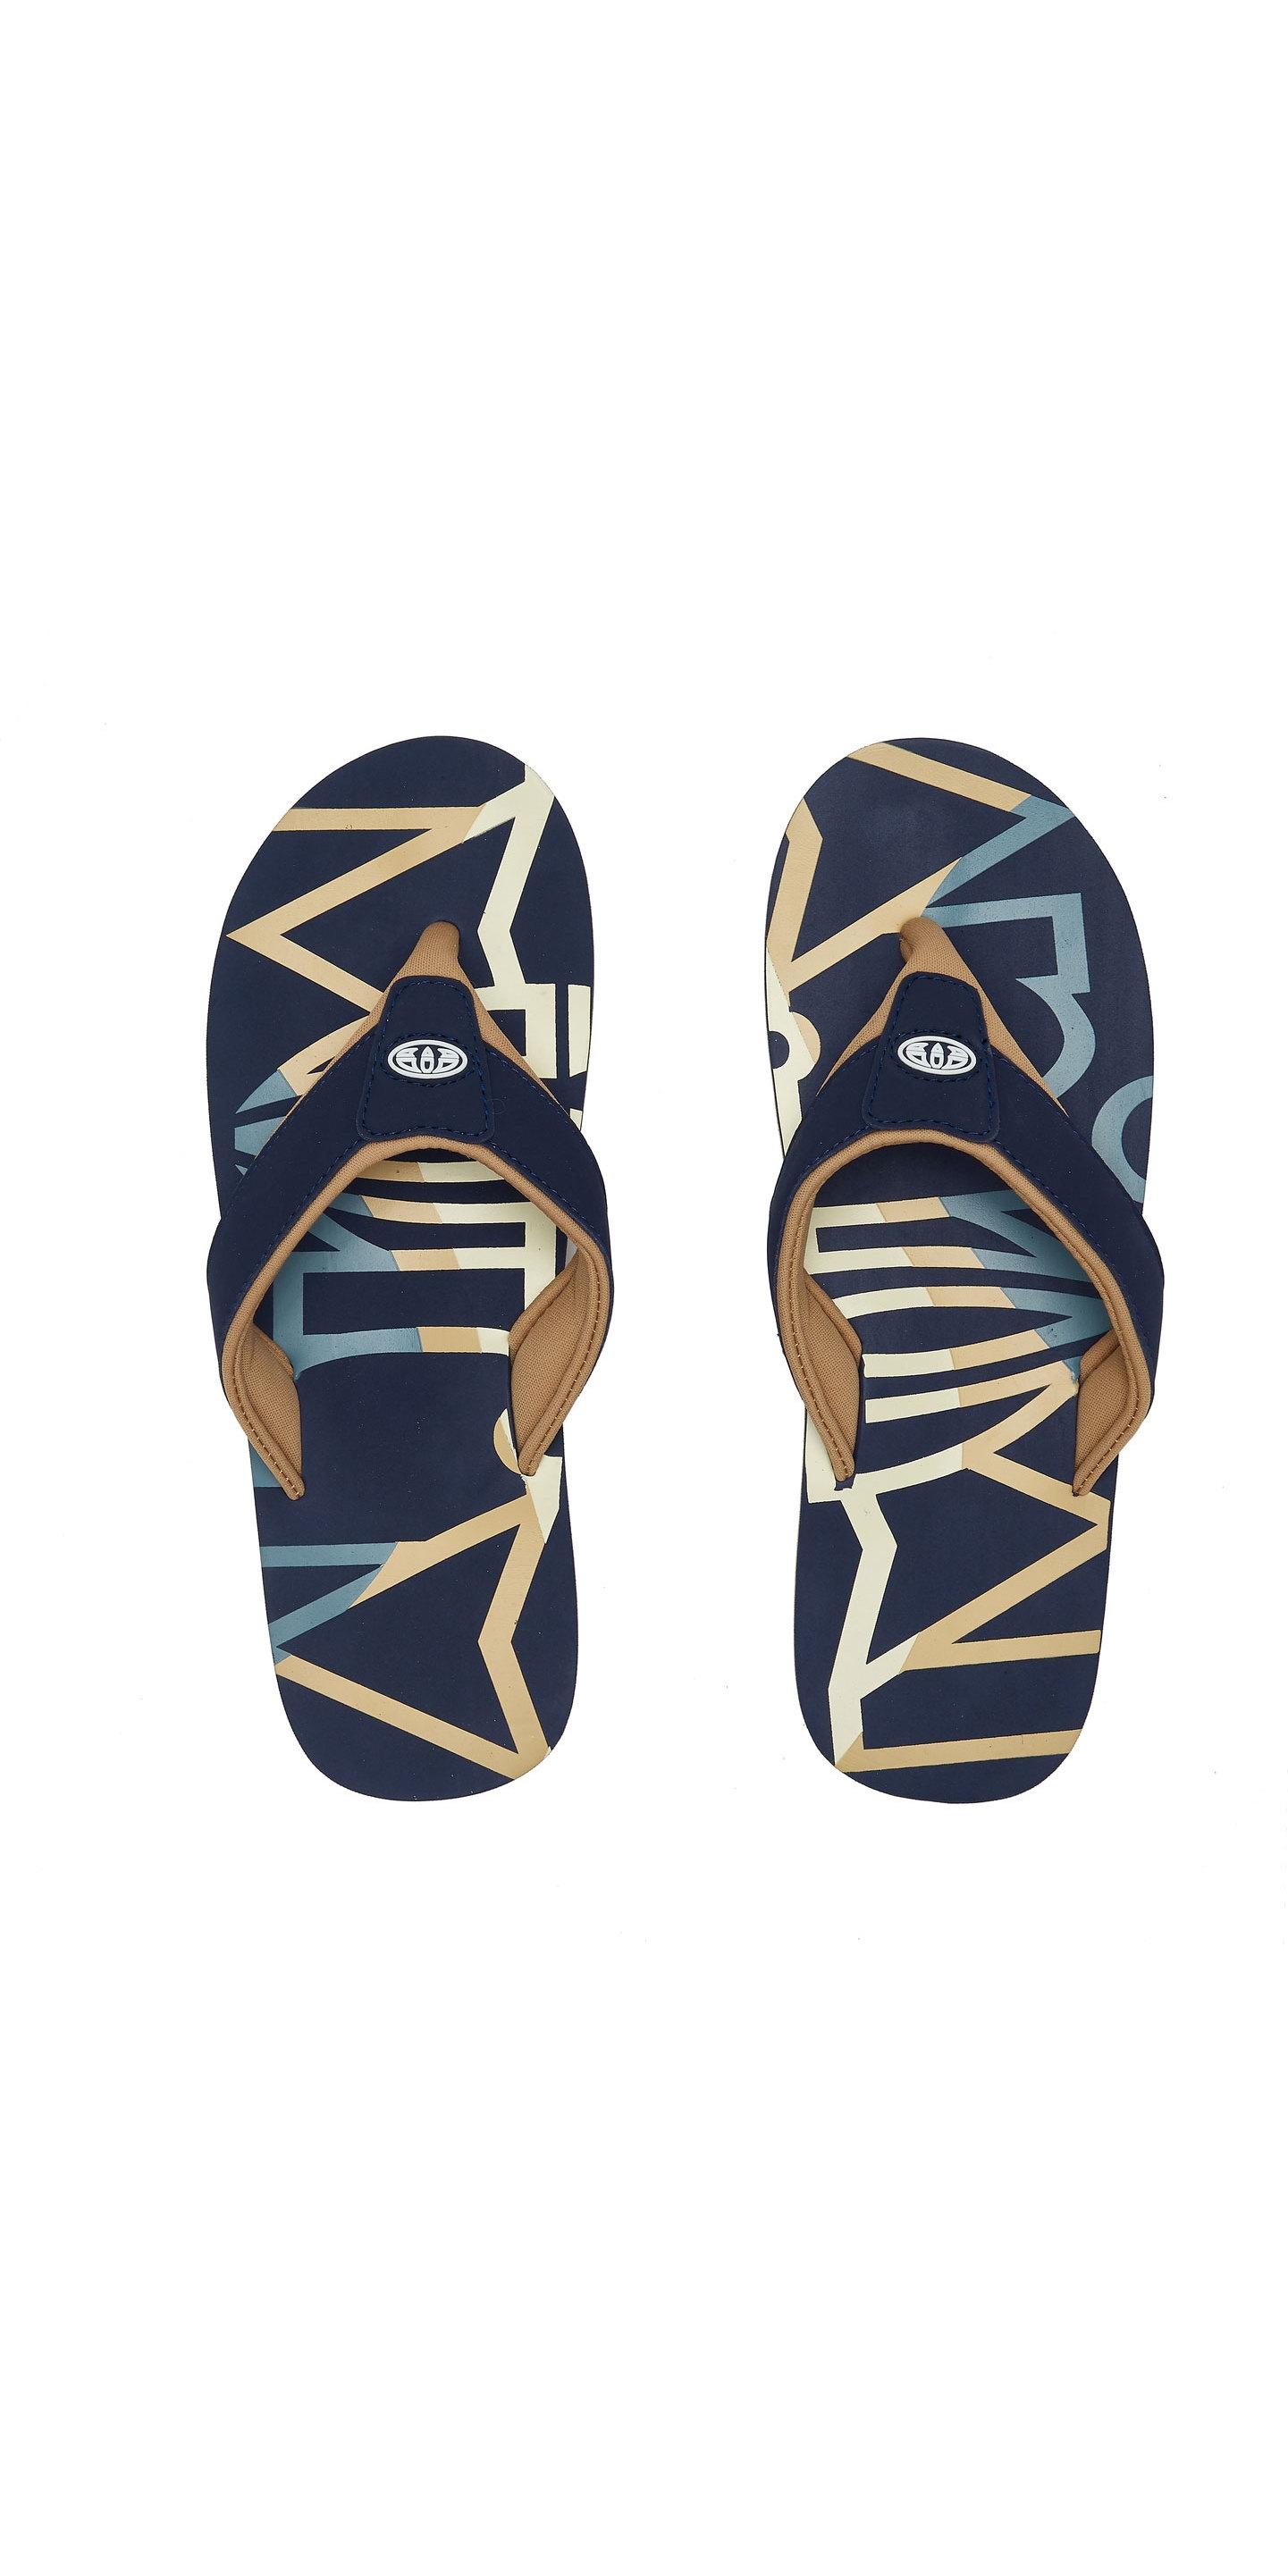 2020 Animal Miesten Bazil Logo Flip Flop Sandaalit Fm0ss002 Indigo Sininen